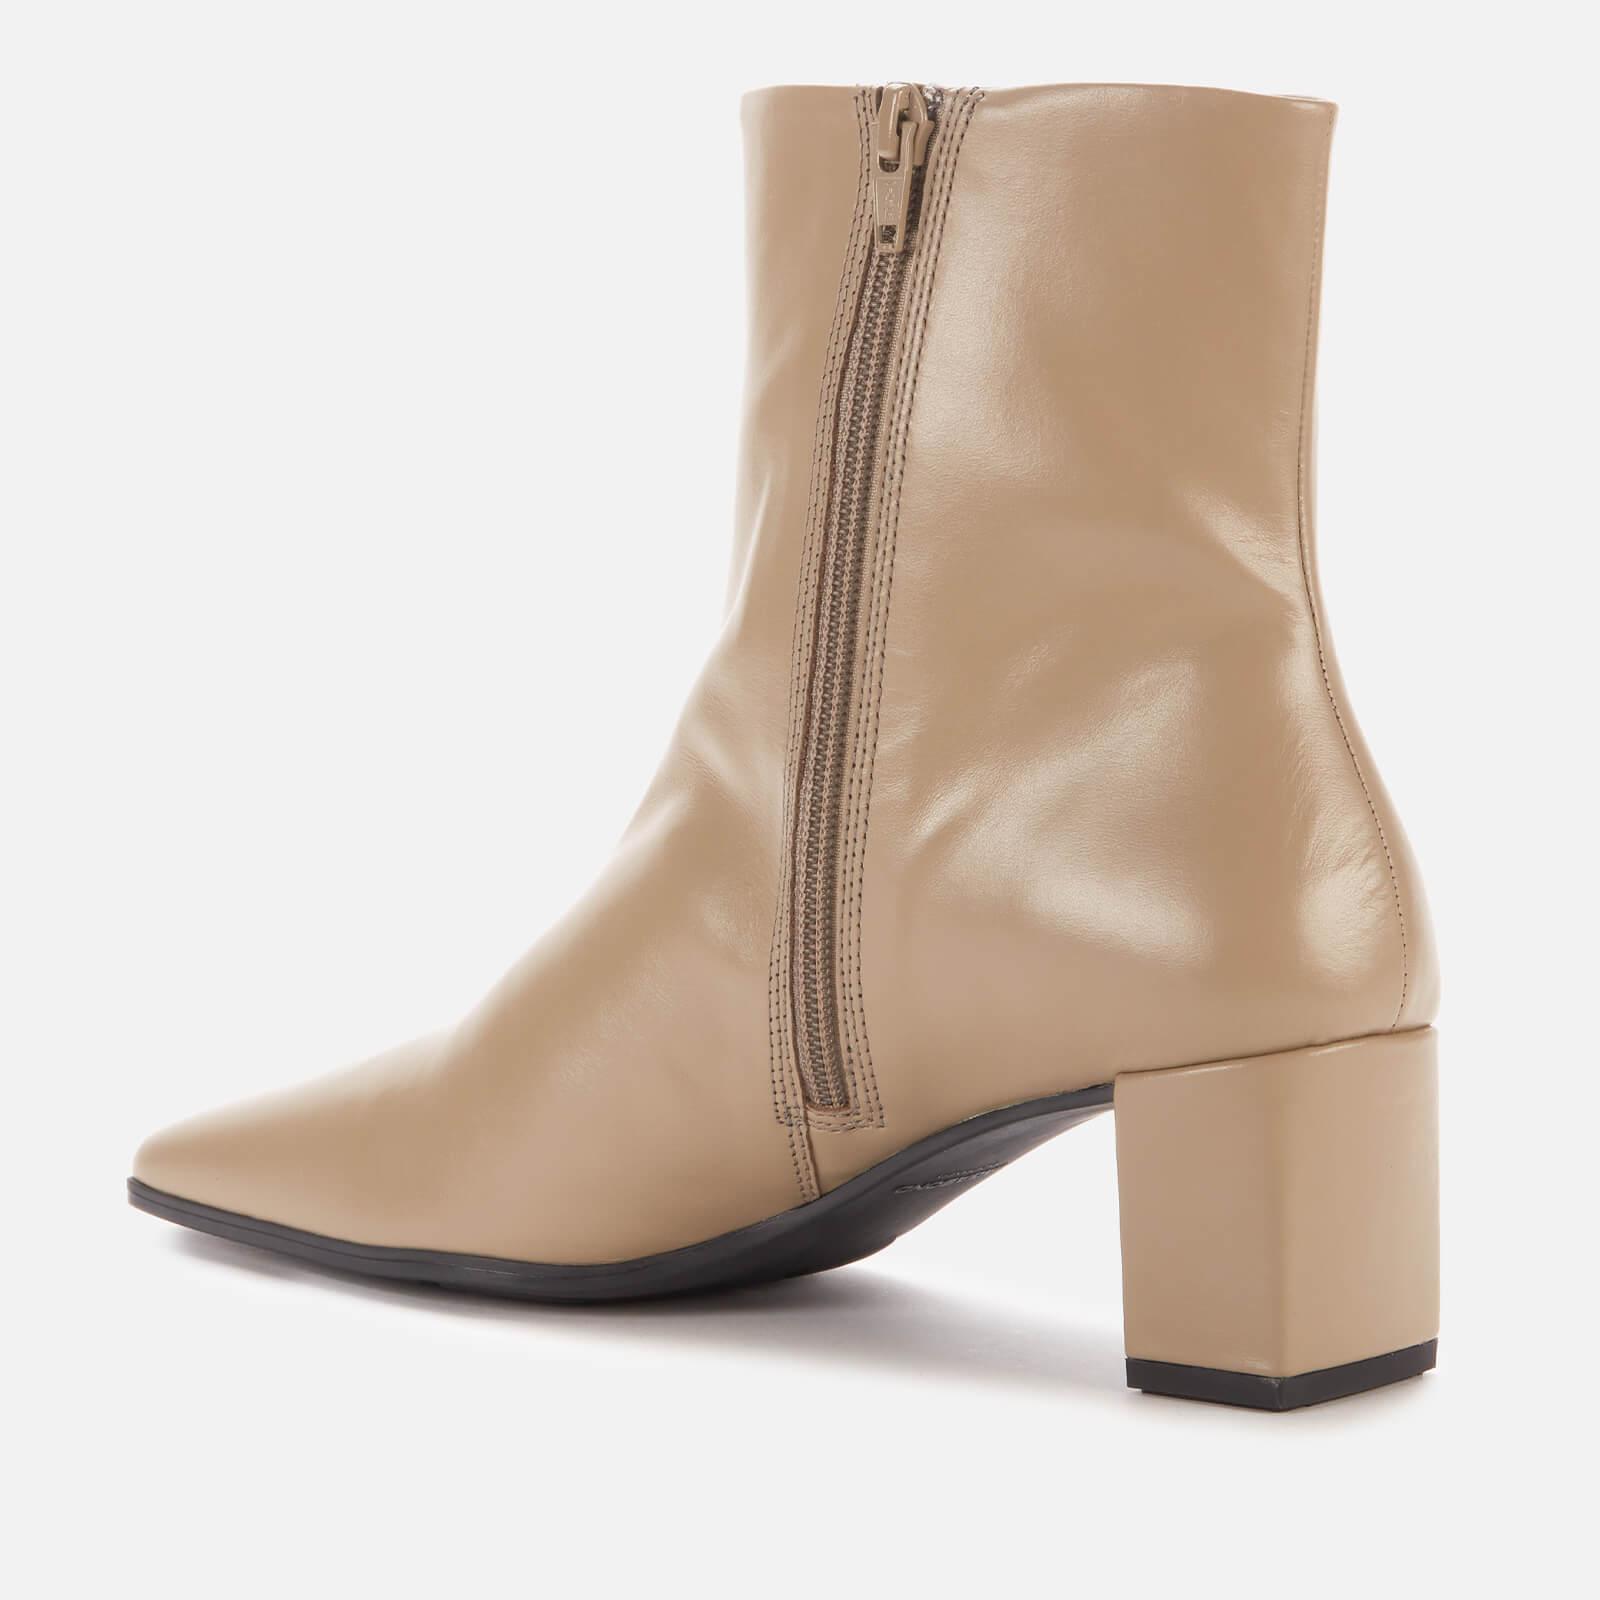 Vagabond Women's Tessa Leather Ankle Boots - Sage - Uk 3